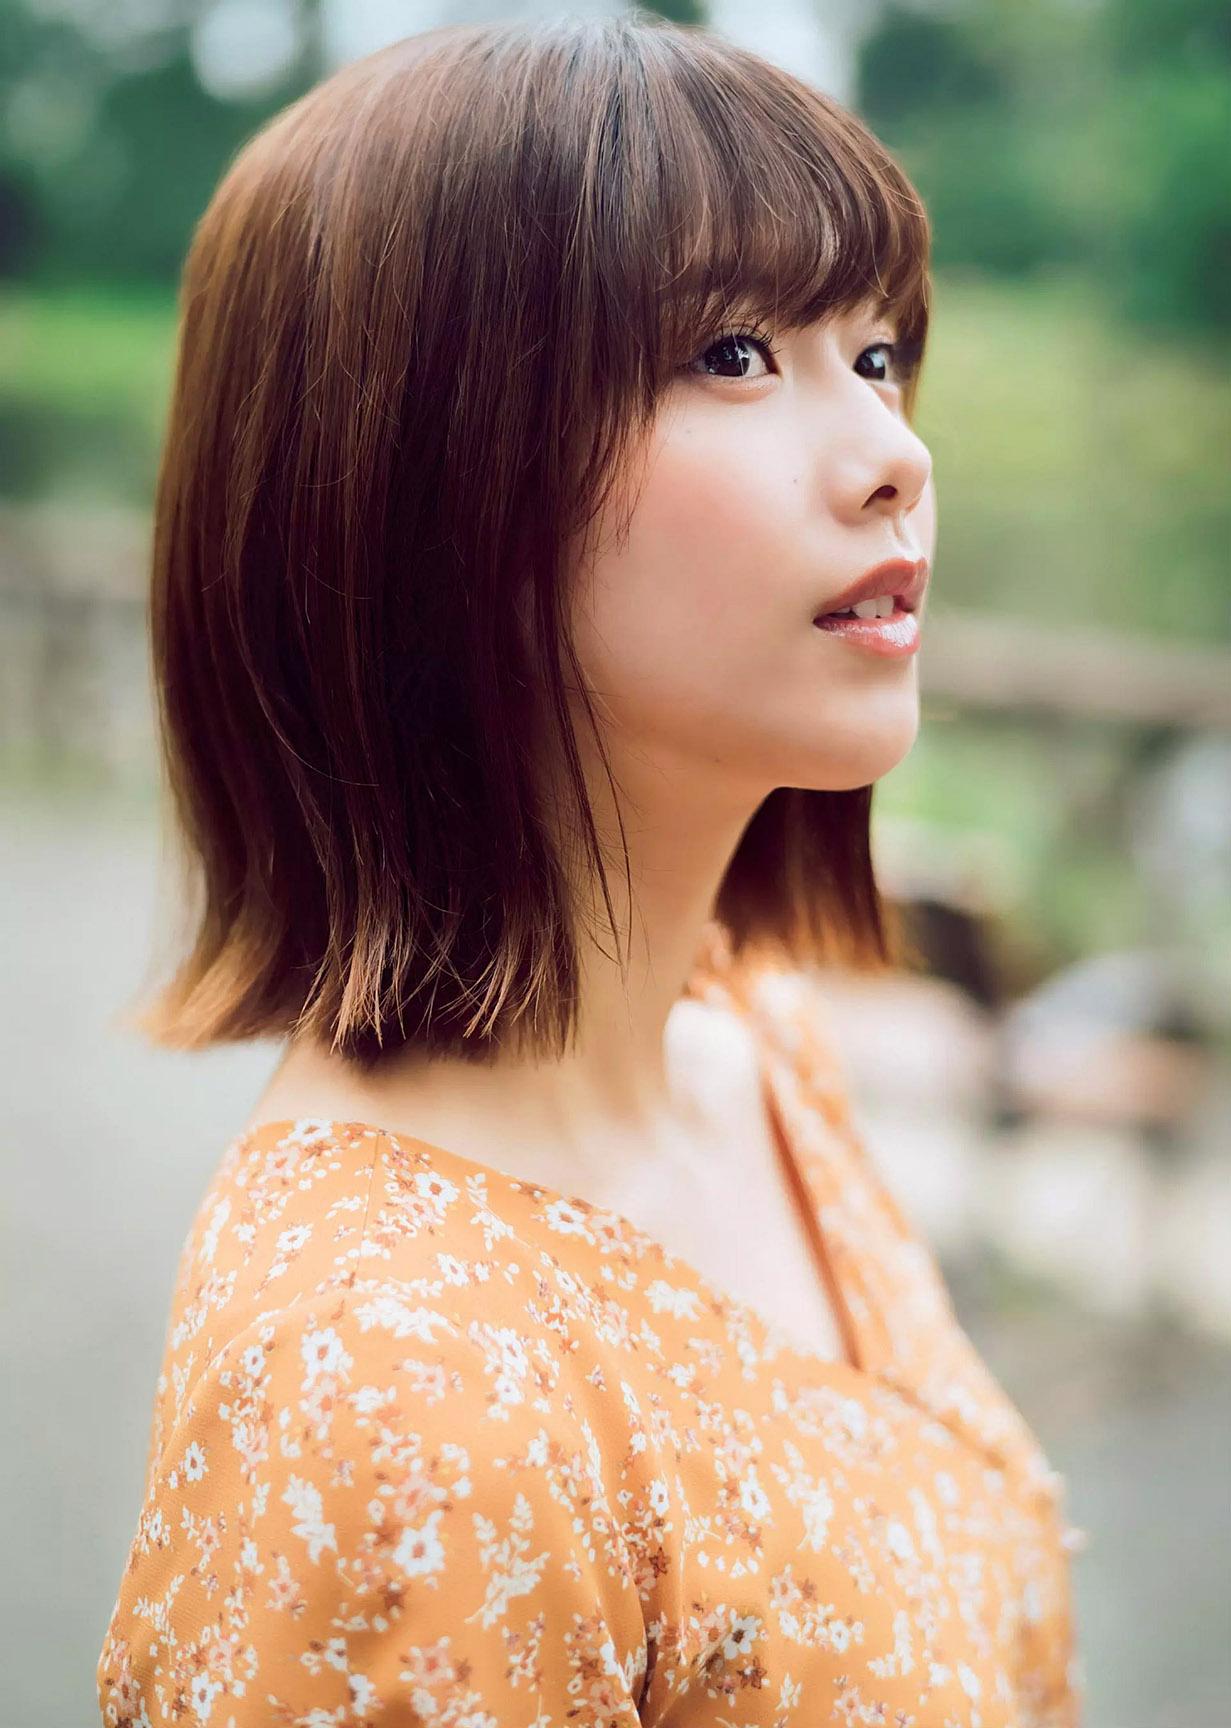 Risa Watanabe Flash 190910 04.jpg